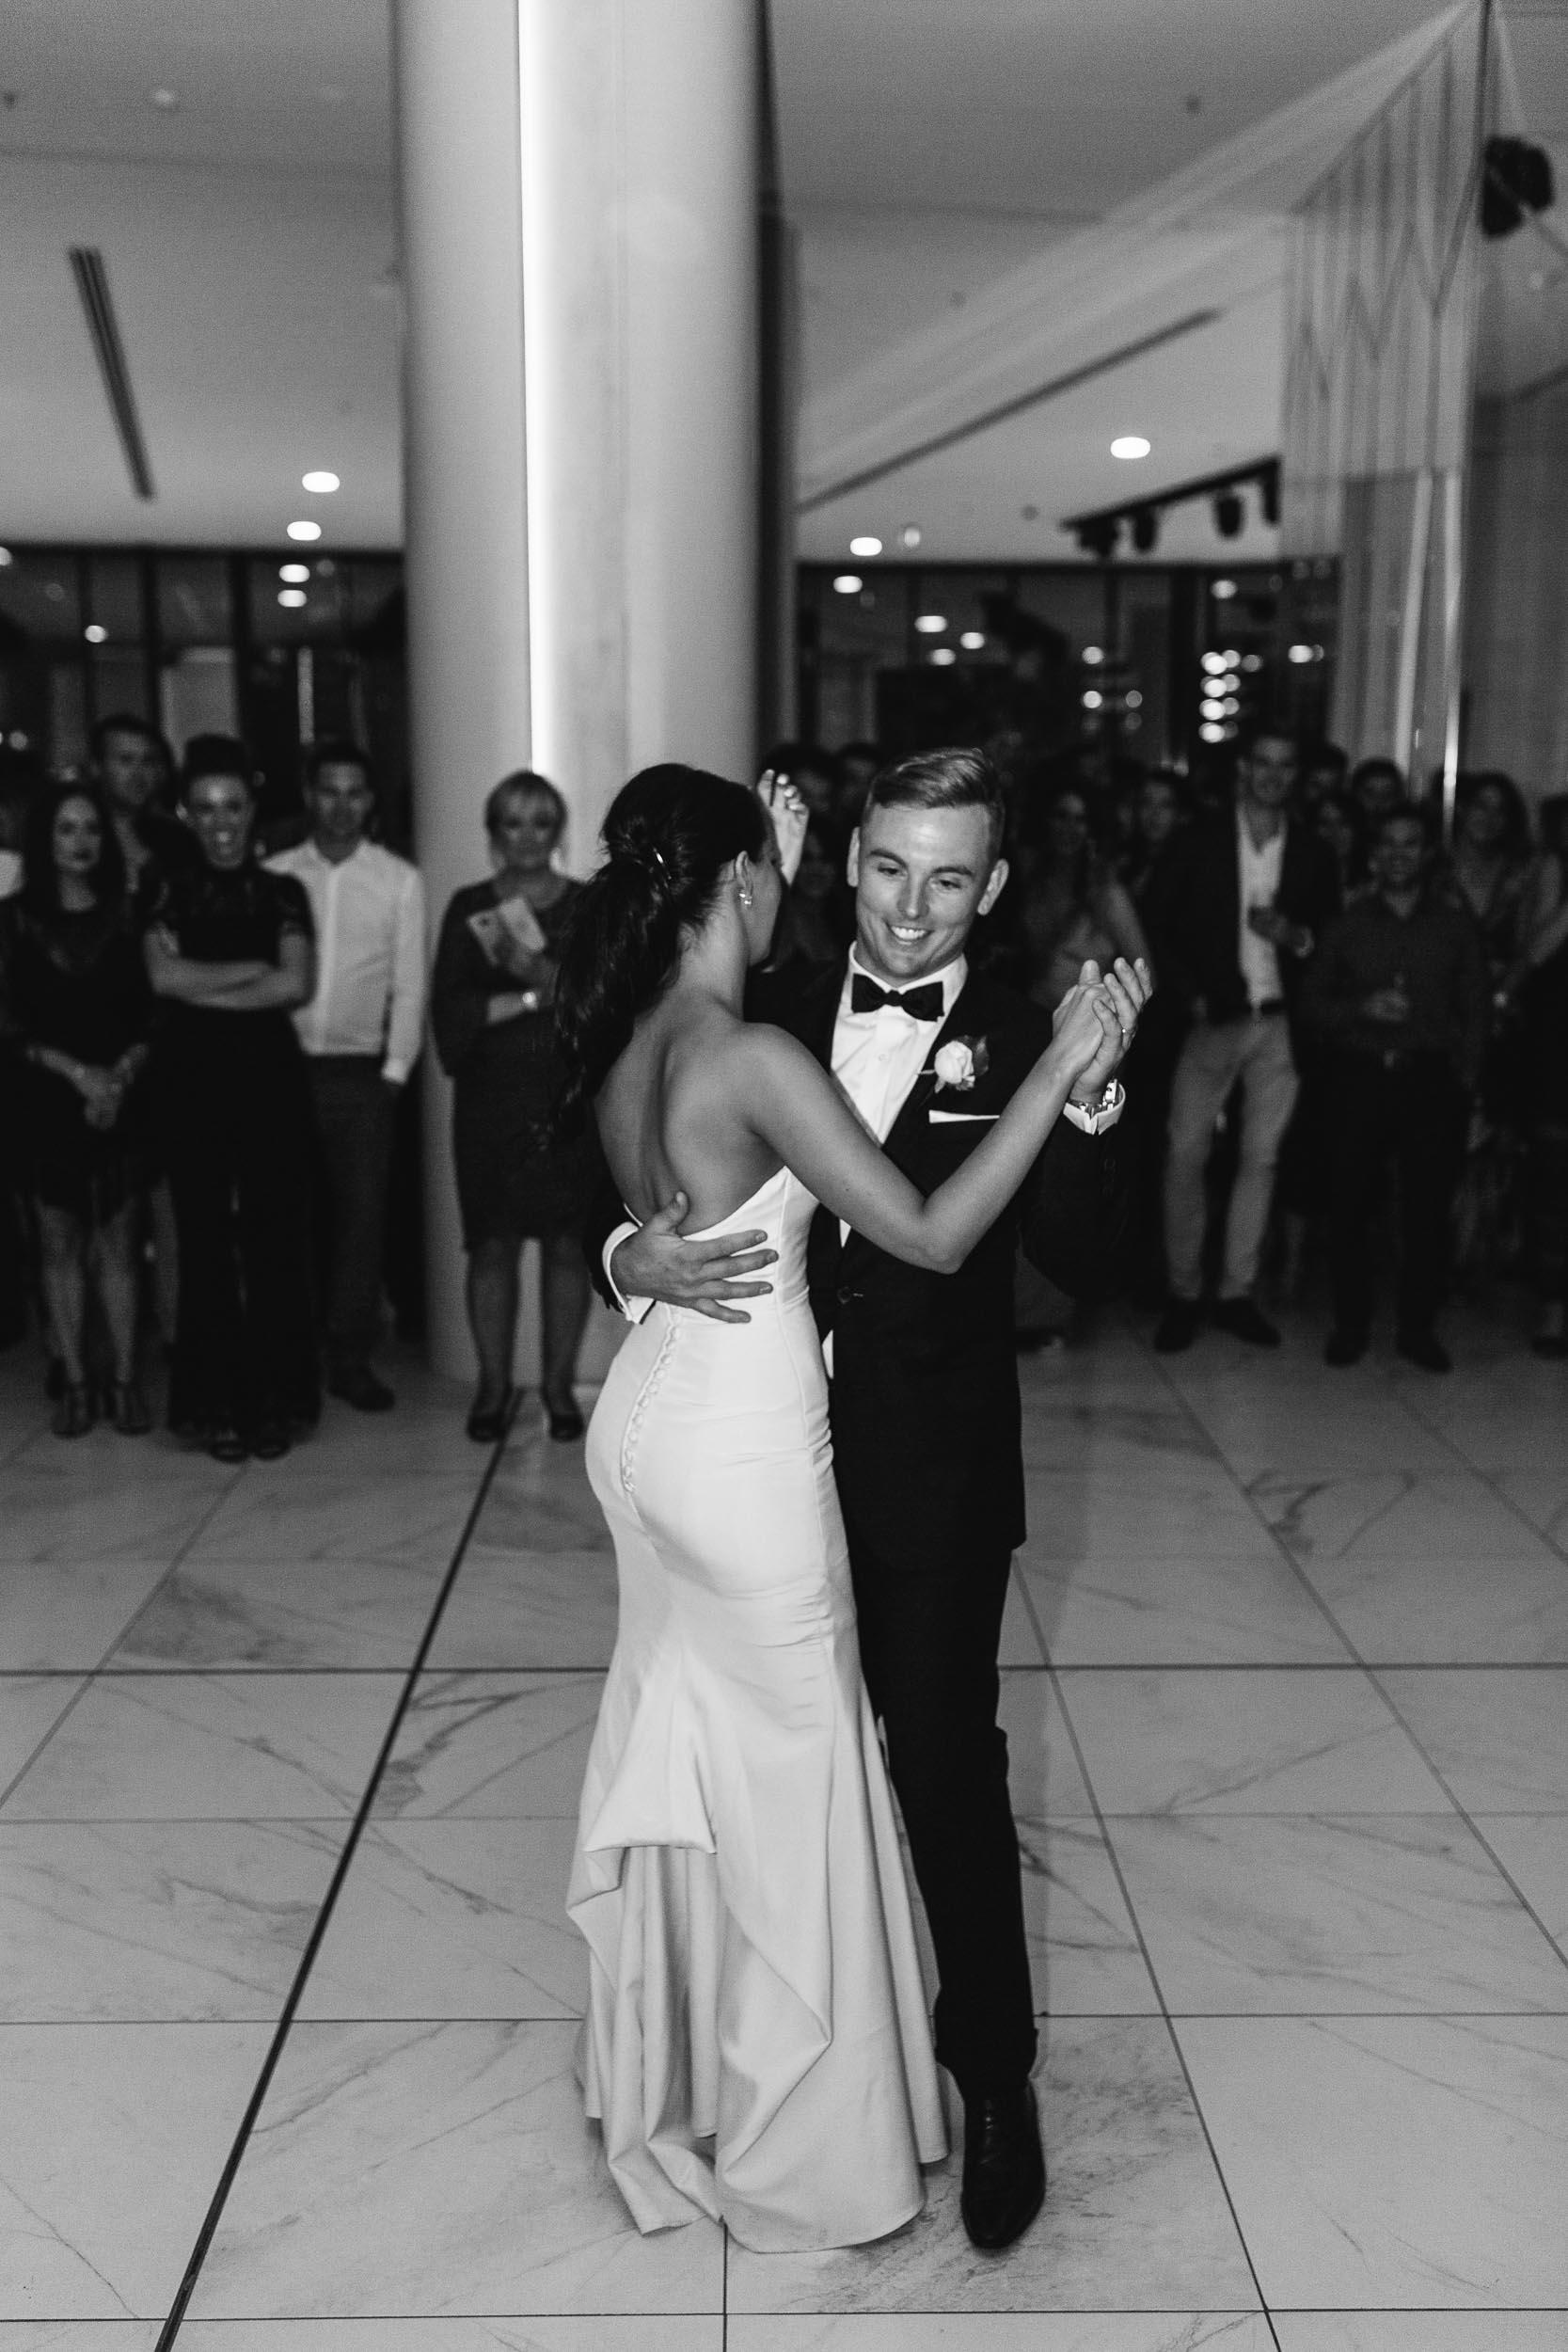 Kas-Richards-Melbourne-Garden-Wedding-Aerial-South-Whark-Georgia-Young-Couture-622.jpg